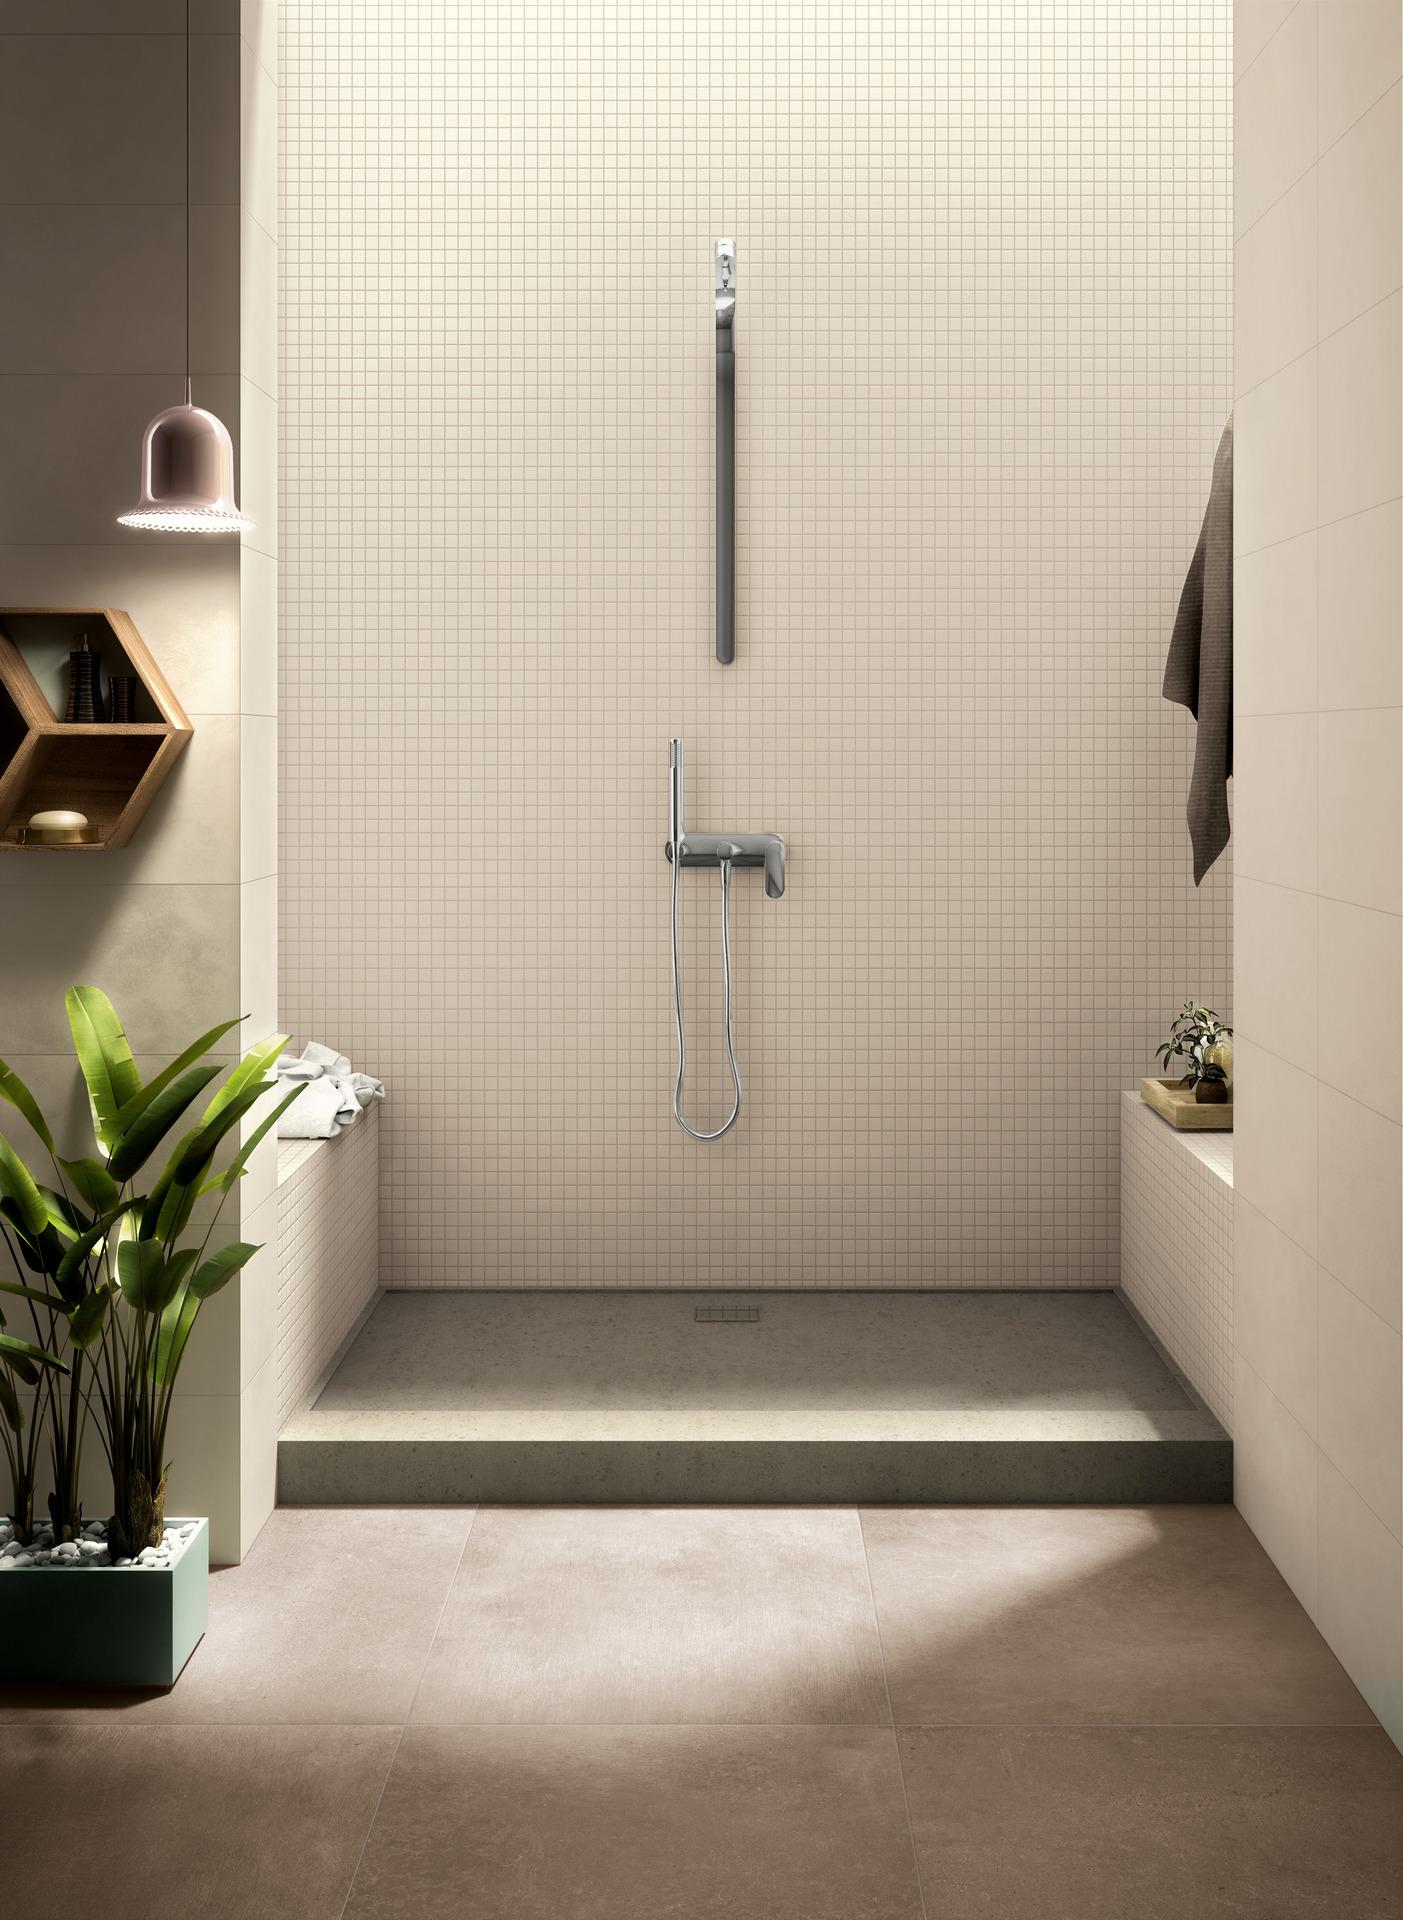 Feel Collection: Matt bathroom wall tiles | Ragno